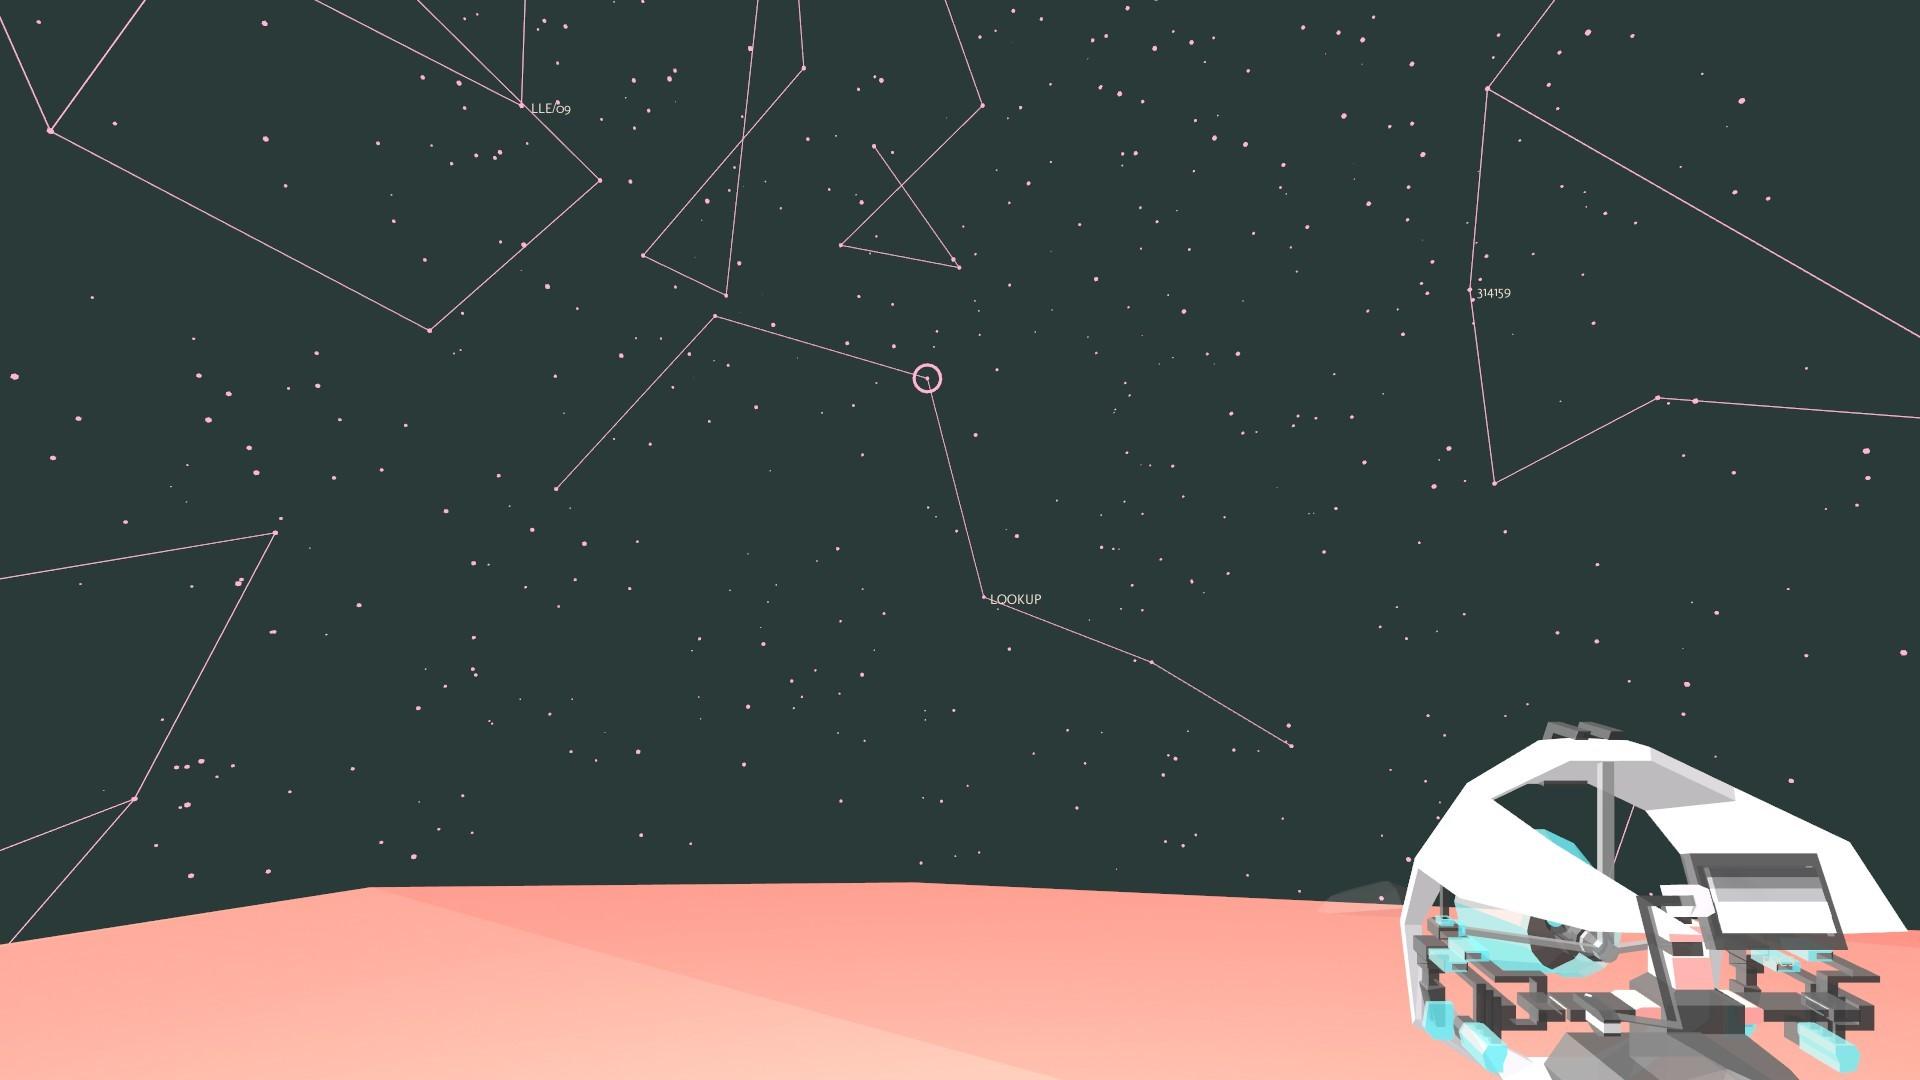 MirrorMoon EP Constellation